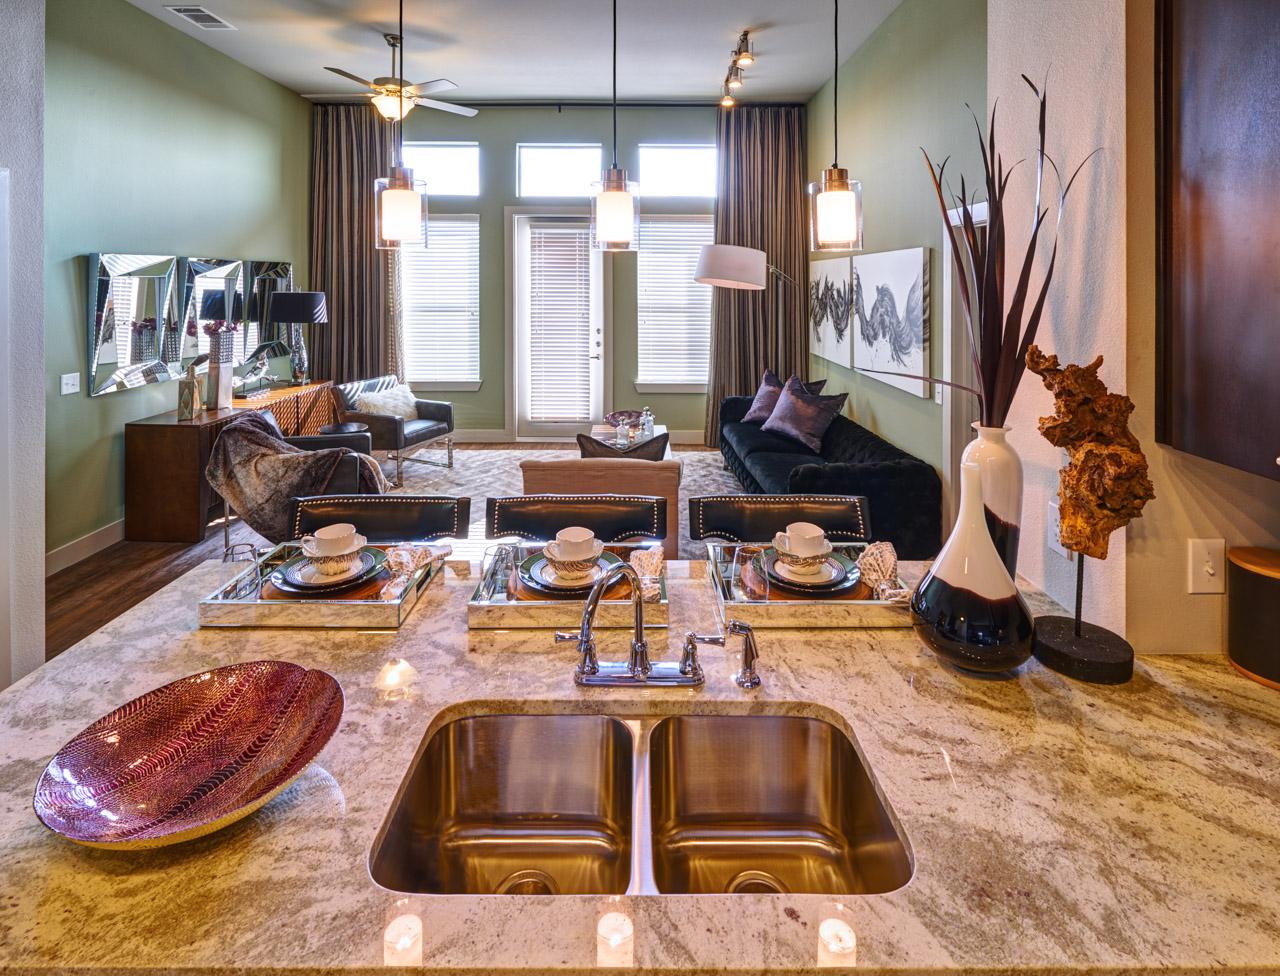 Avenue H Apartments, Dallas, Texas